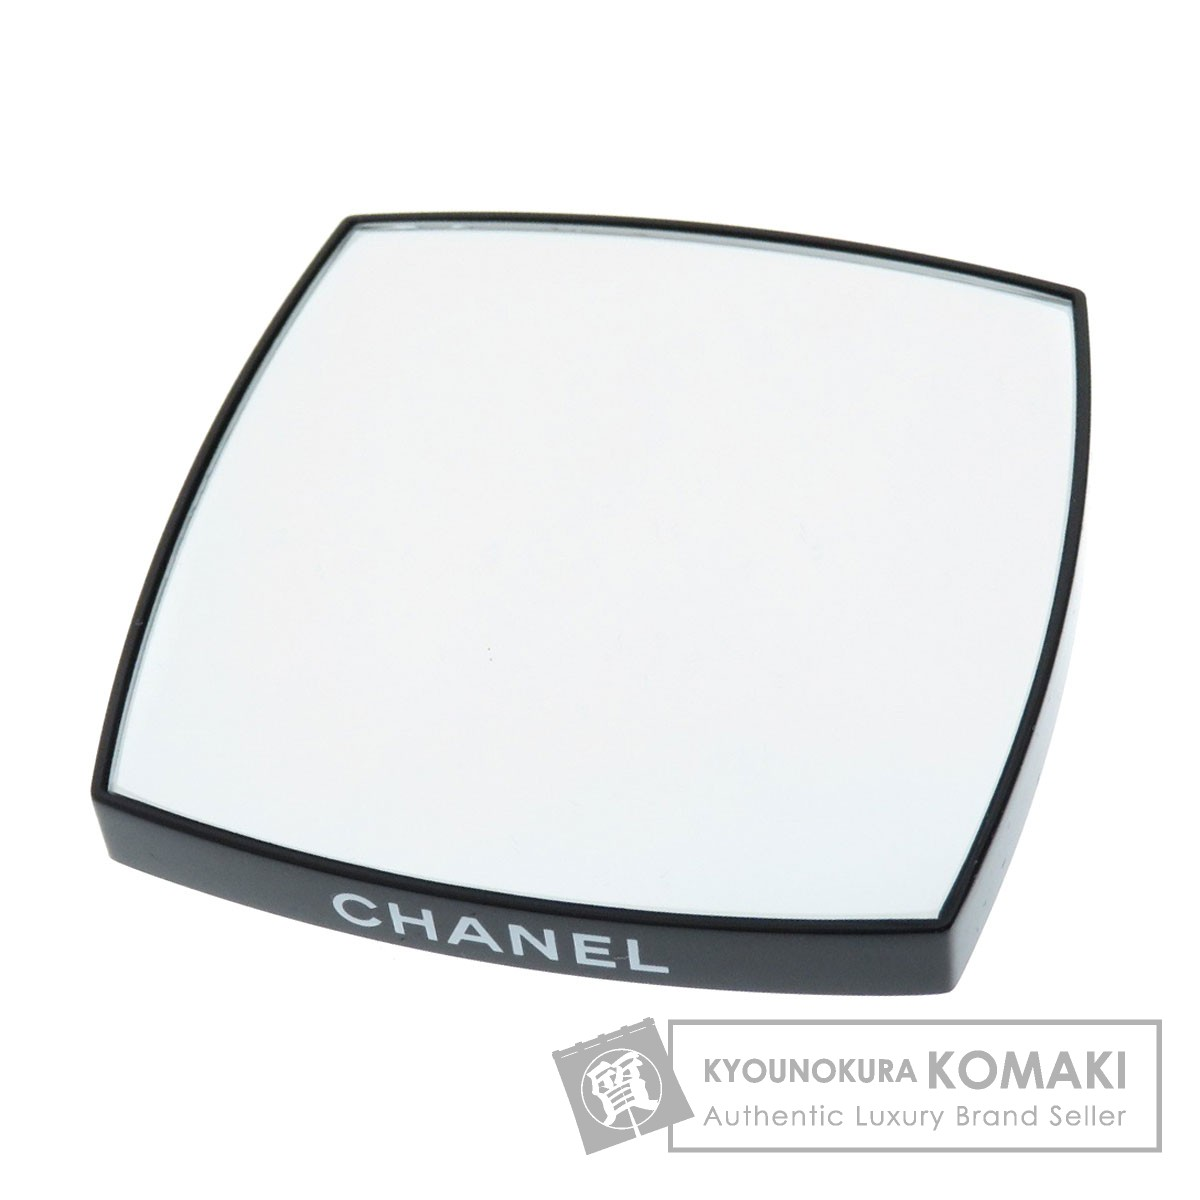 c069b8f1df Kyonokura Komaki Brand Cheapest Challenger: Authentic CHANEL Logo ...